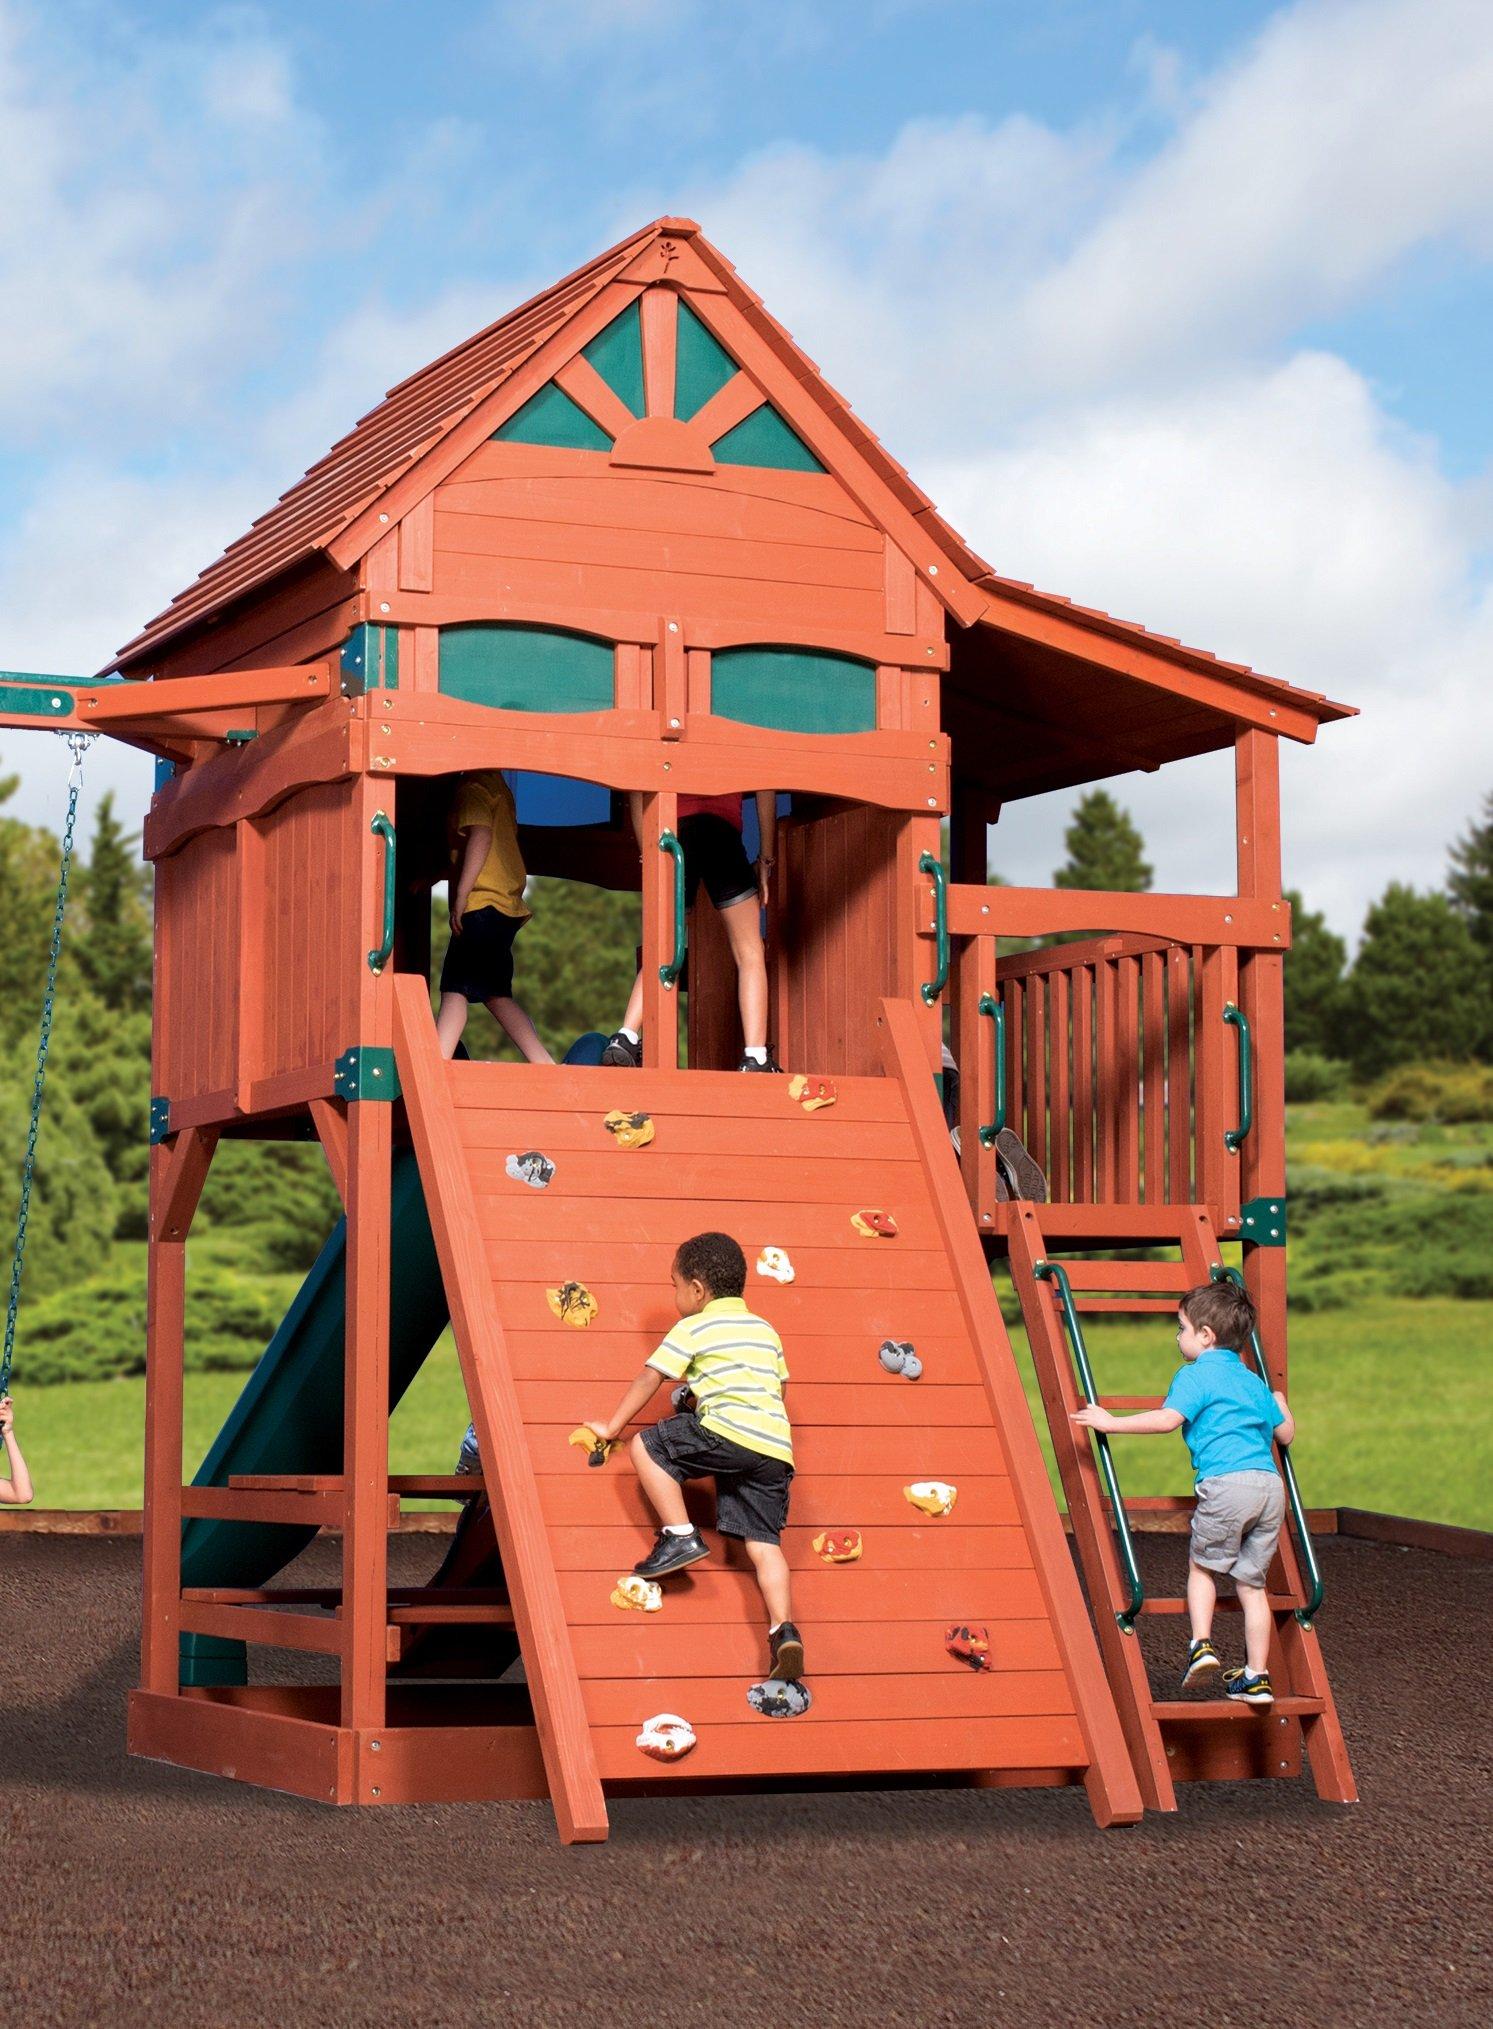 Backyard Adventures Treehouse Series in Idaho